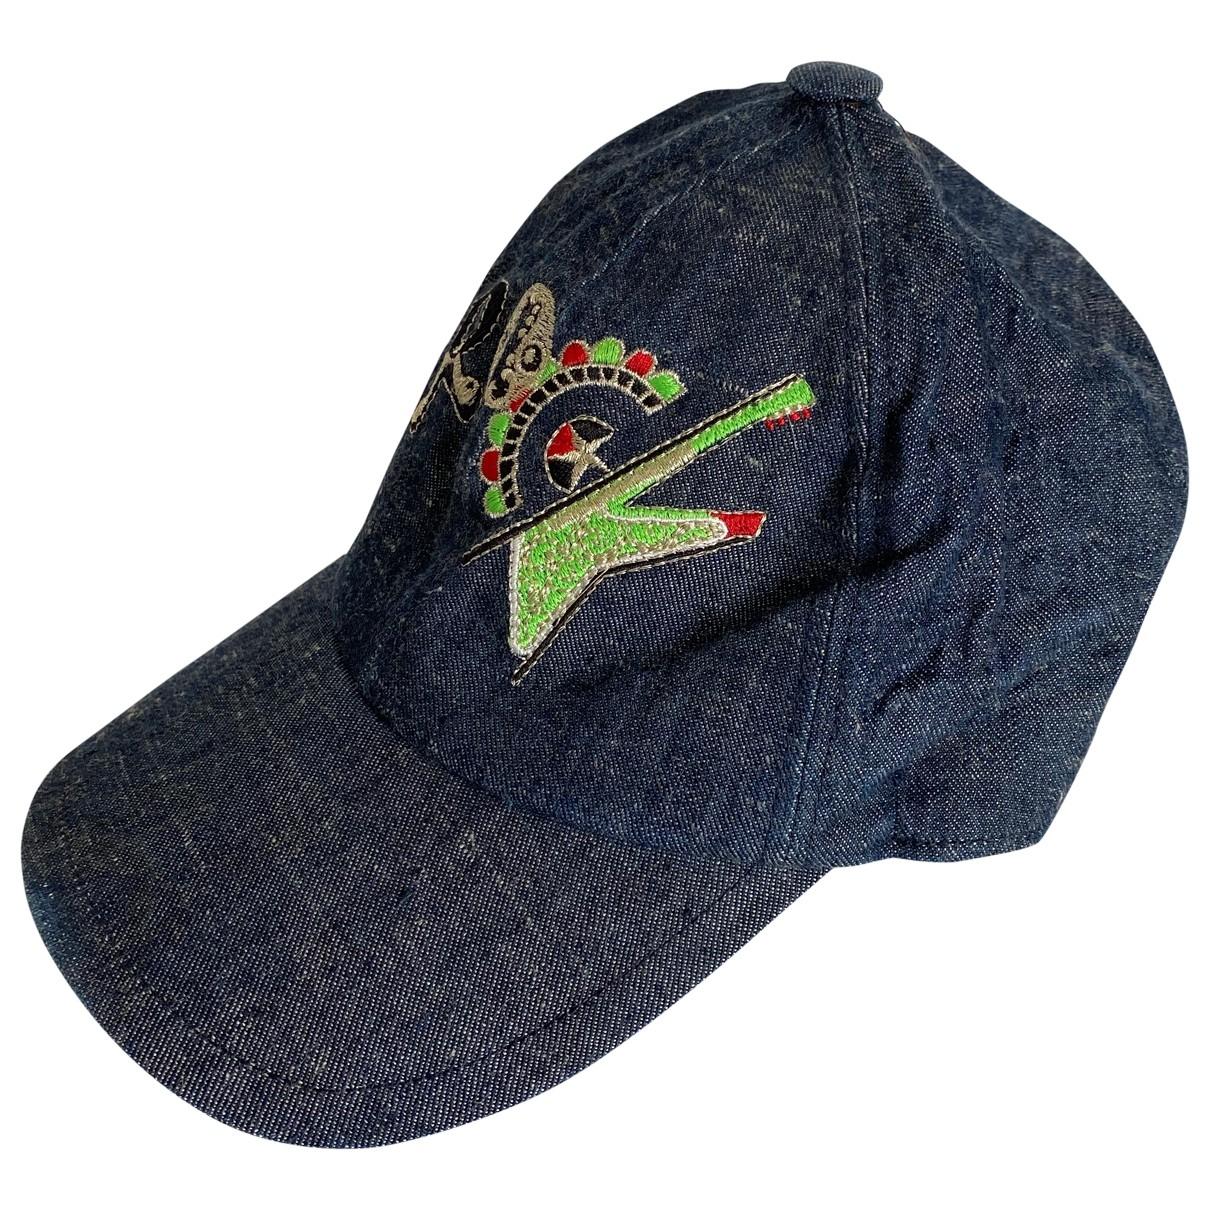 Versace Jeans \N Blue Cotton hat for Women S International